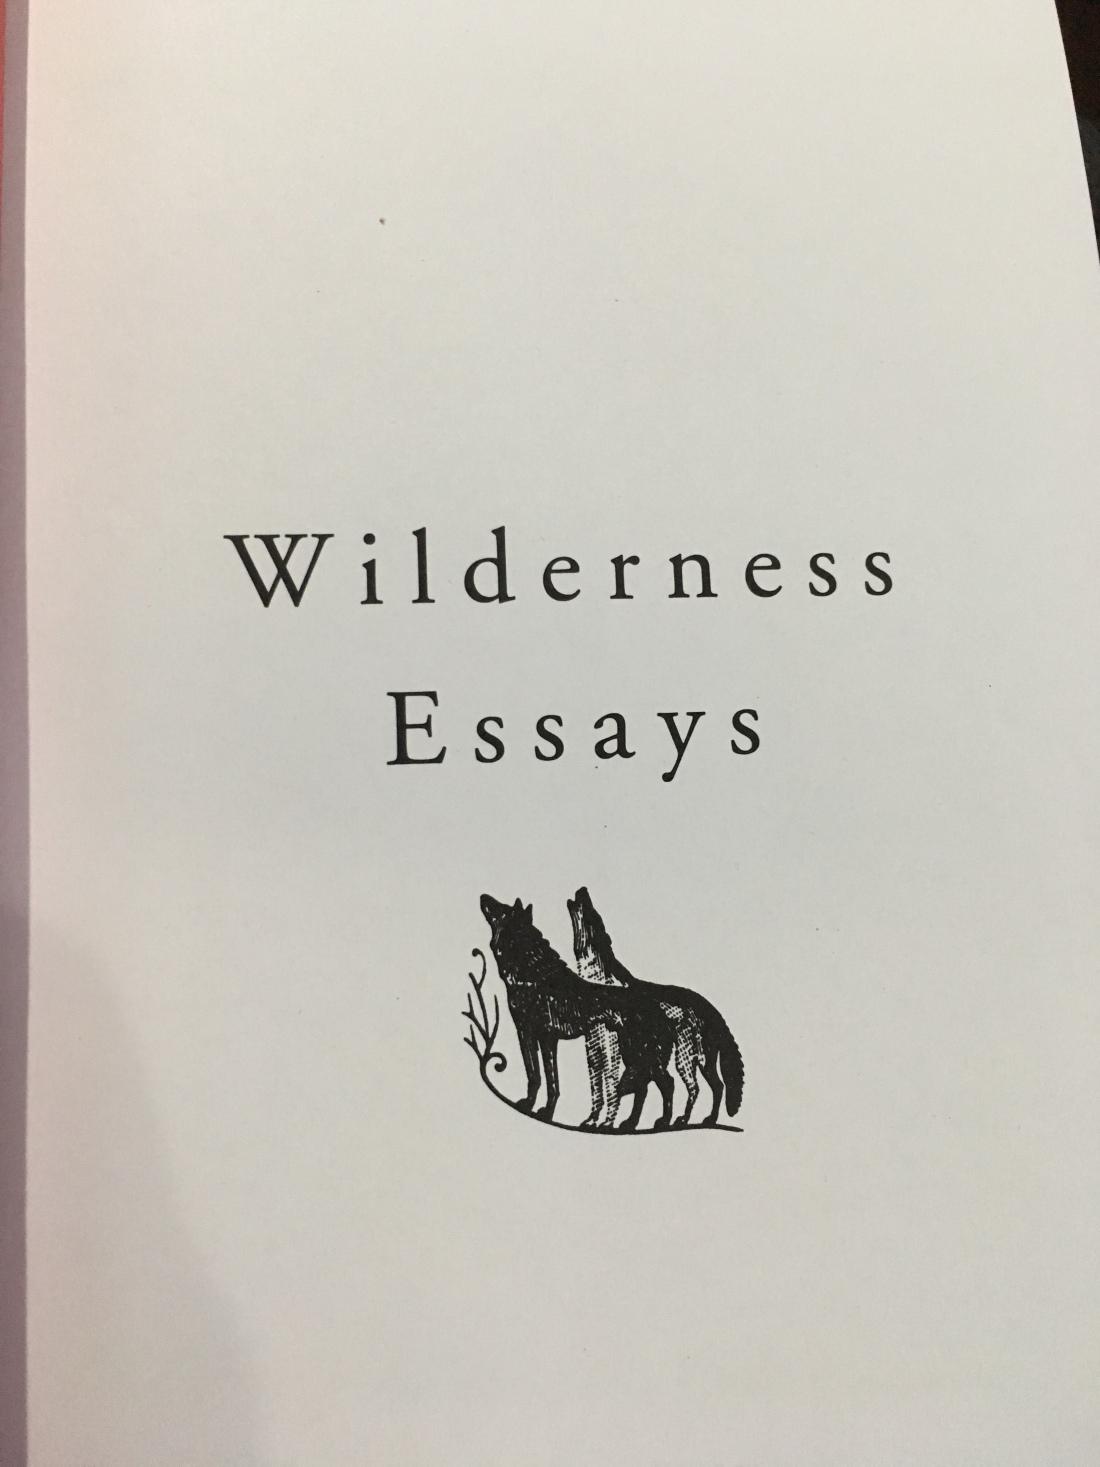 012 Essay Example John Muir Wilderness Essays Img 4826w1100 Best Pdf Review Full